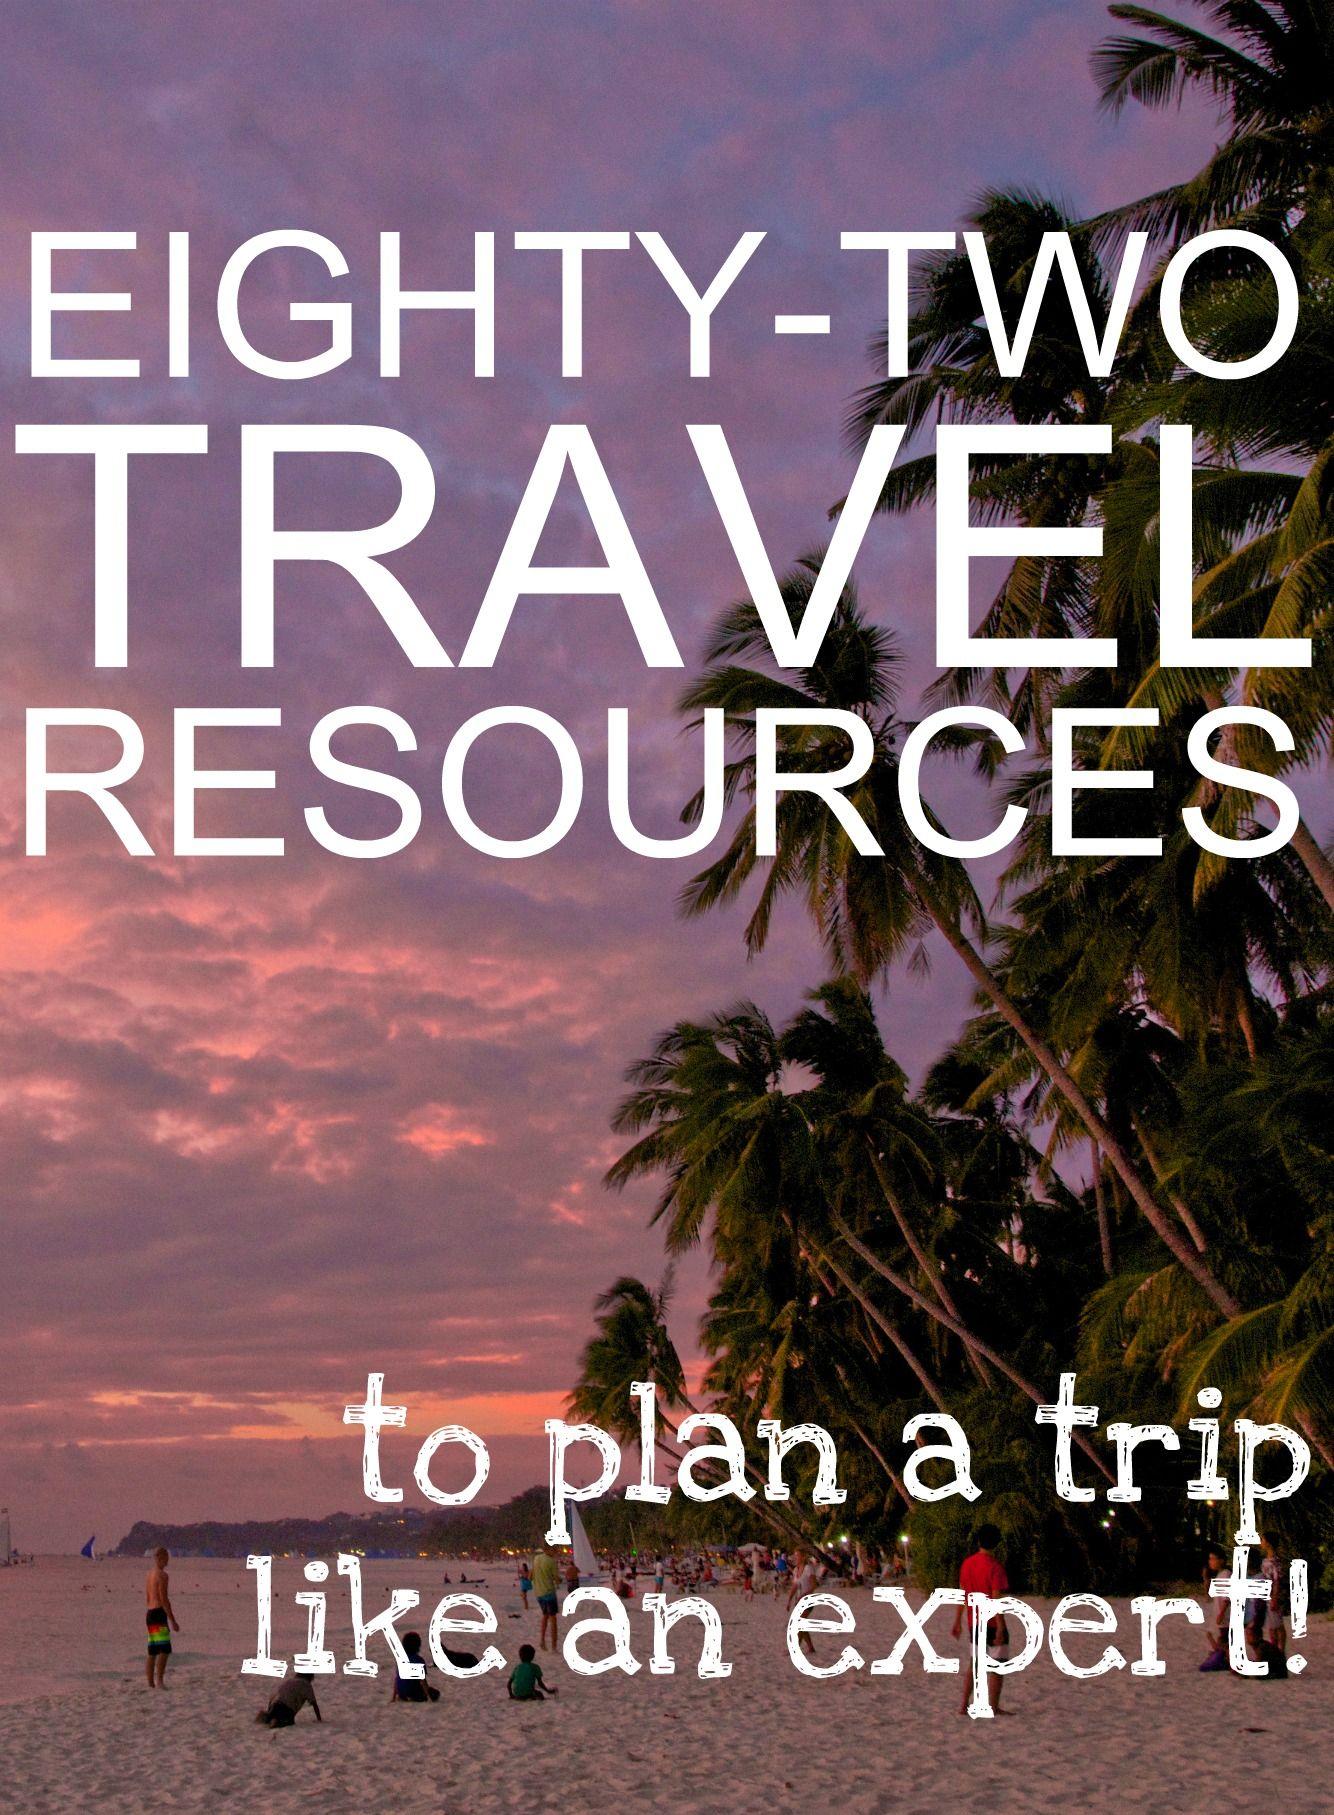 Cosicas de viajes